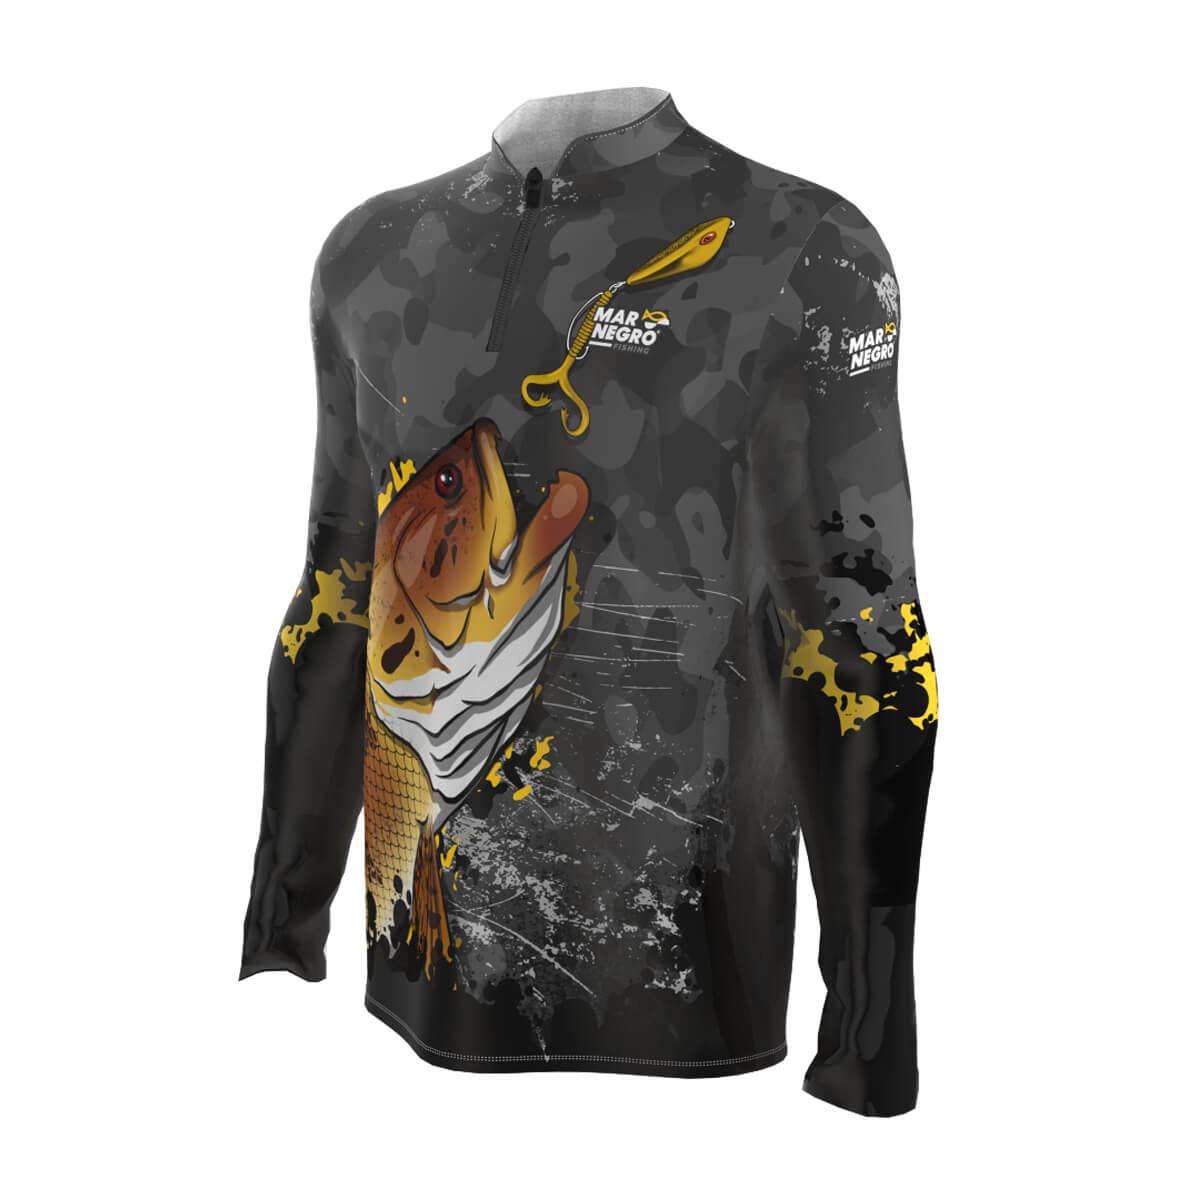 Camiseta Mar Negro 2021 Traira  - Pró Pesca Shop